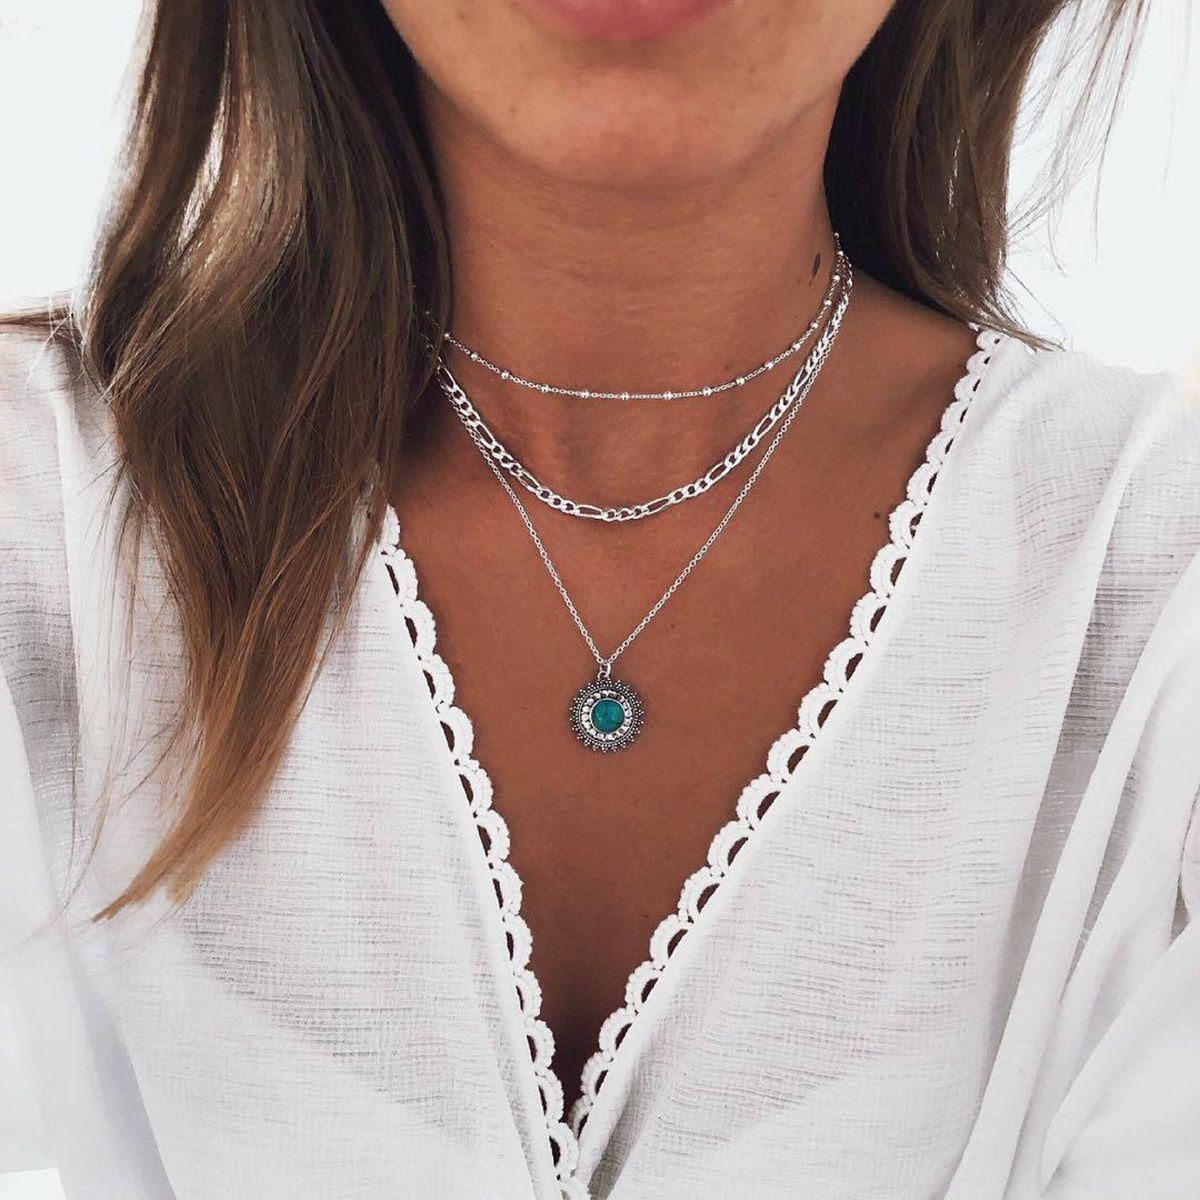 Bohemian Style Pendant Bead Necklace